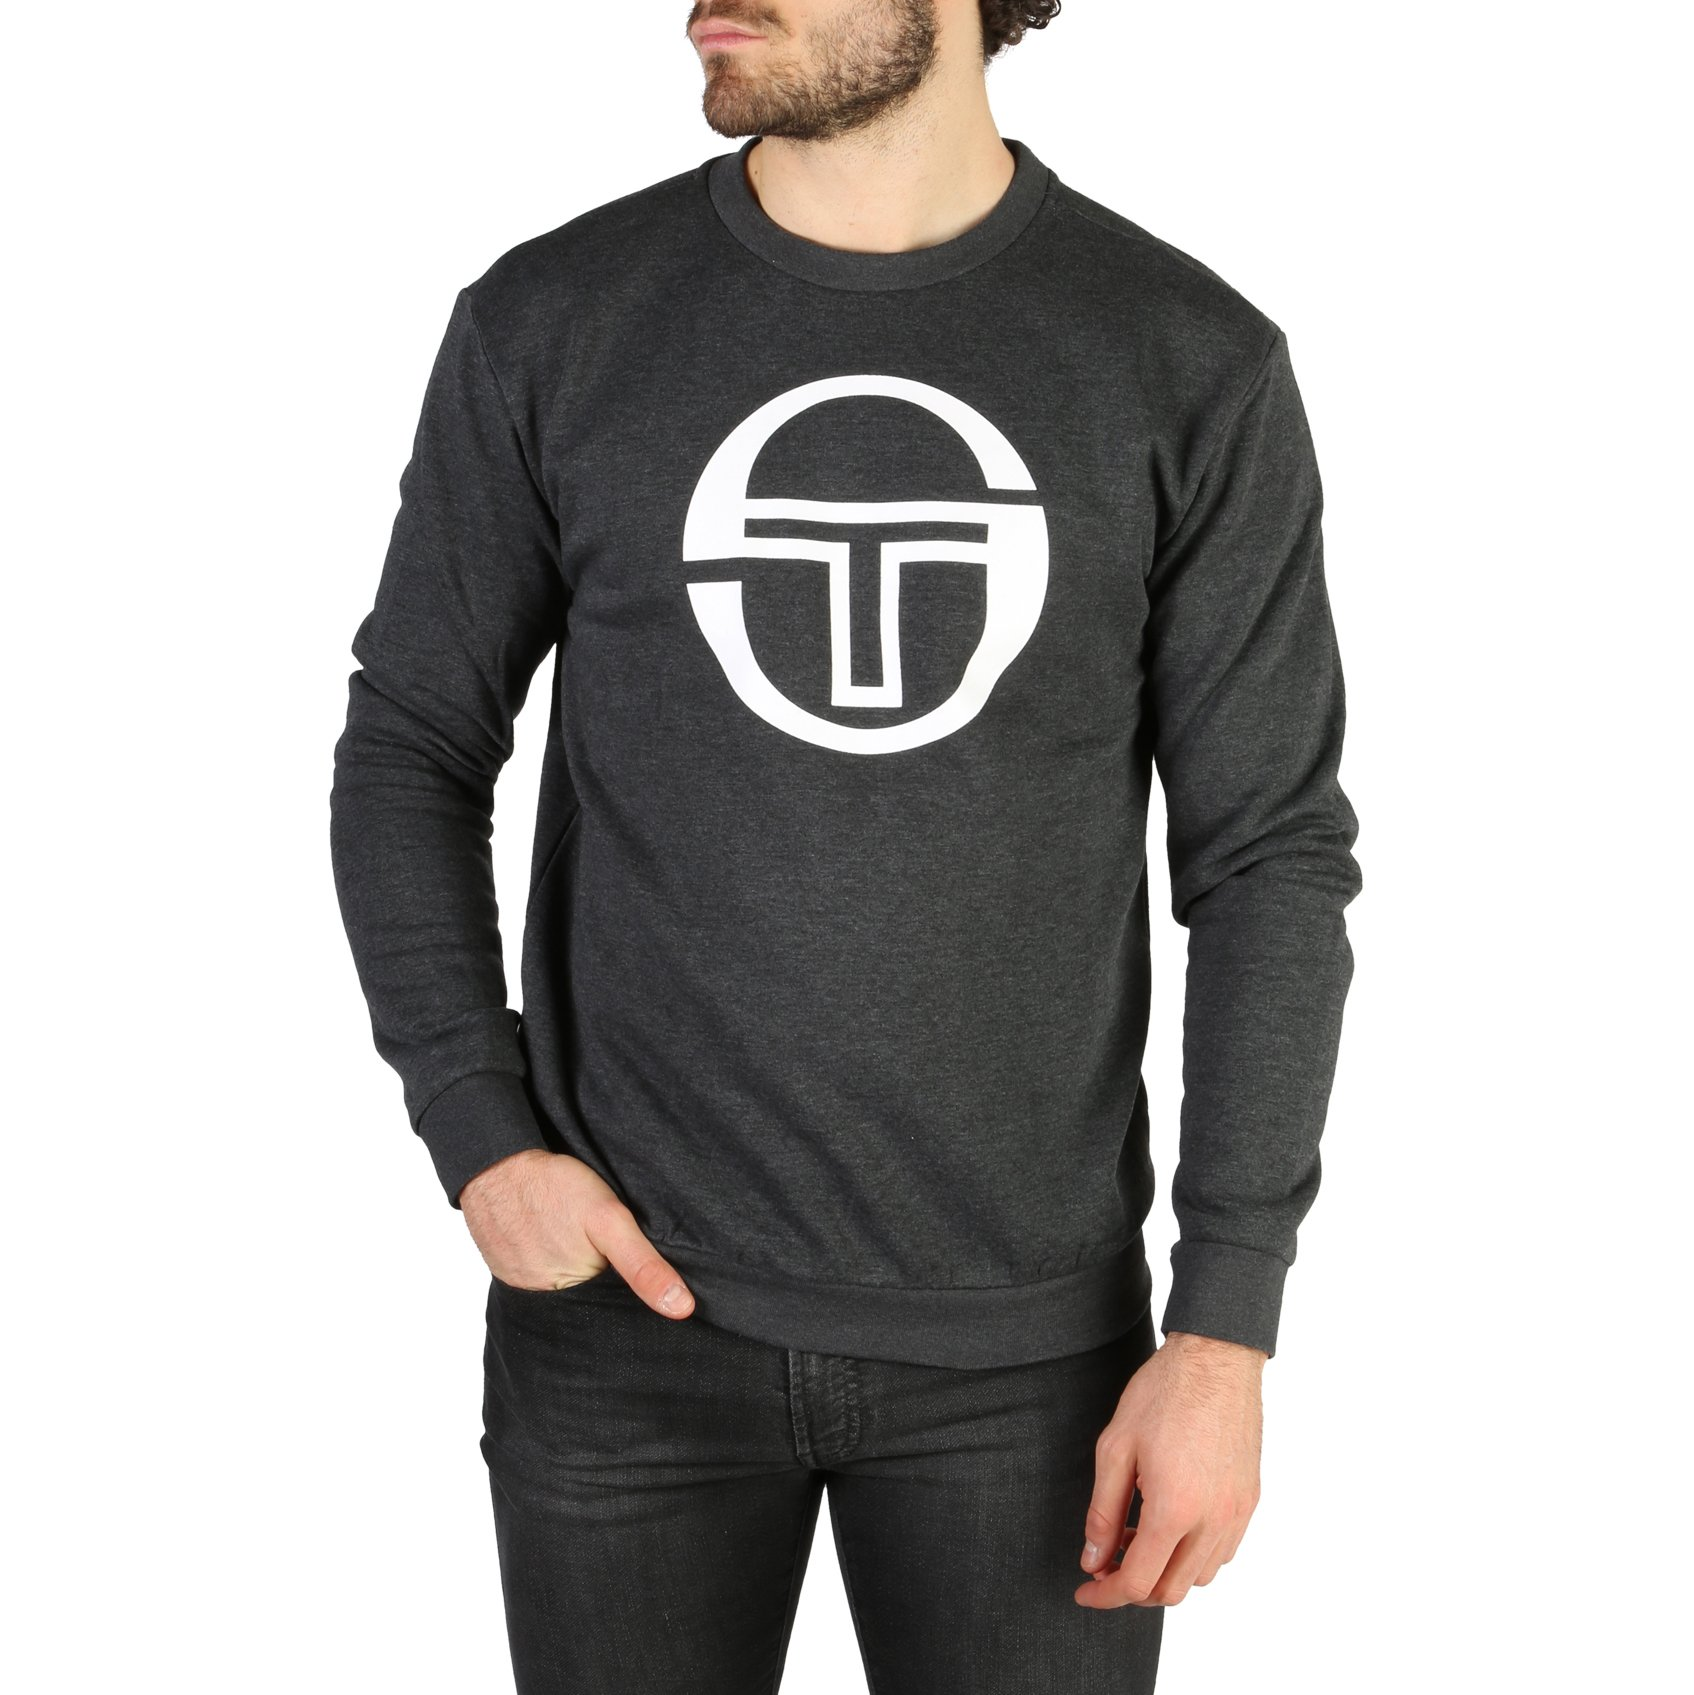 Sergio Tacchini Men's Sweatshirt Various Colours 103-10005 - black XXL